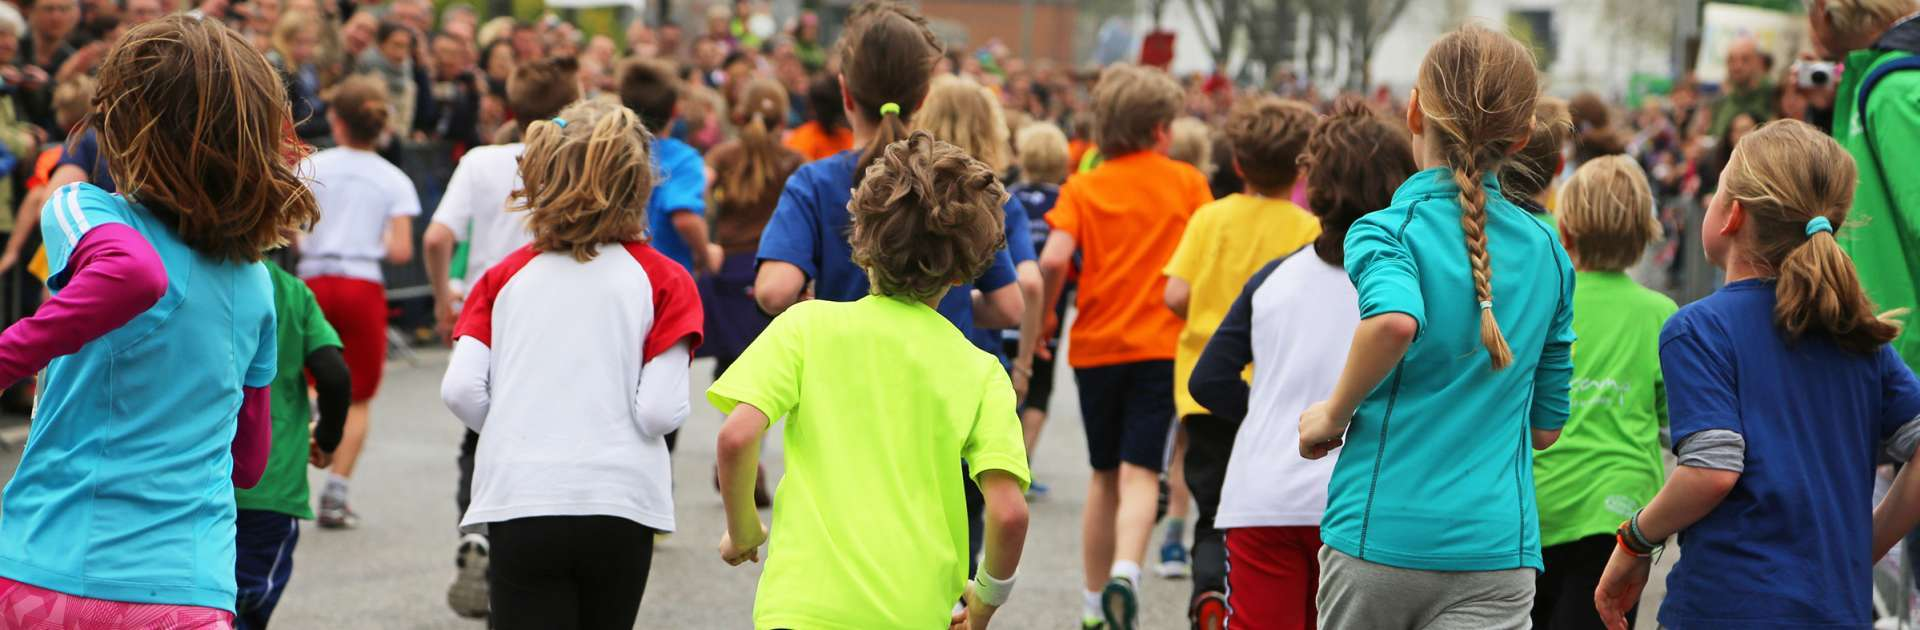 Madison WI Autism Recreational Programming